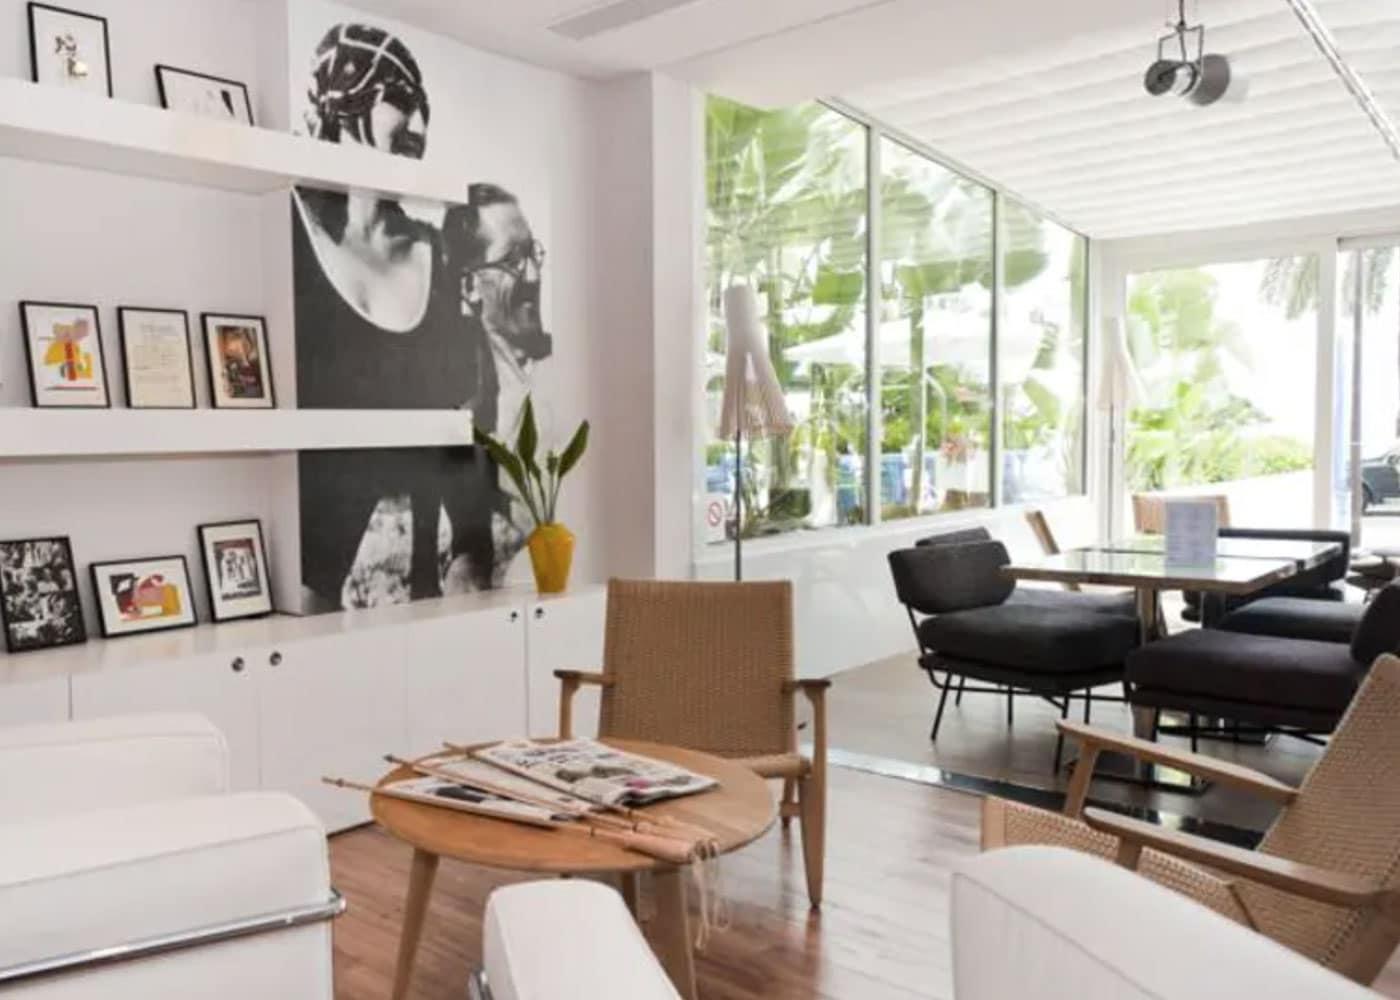 Confinez-moi-ici-Hotel-Victoria-Roquebrune-Cap-Martin-Cap-Moderne